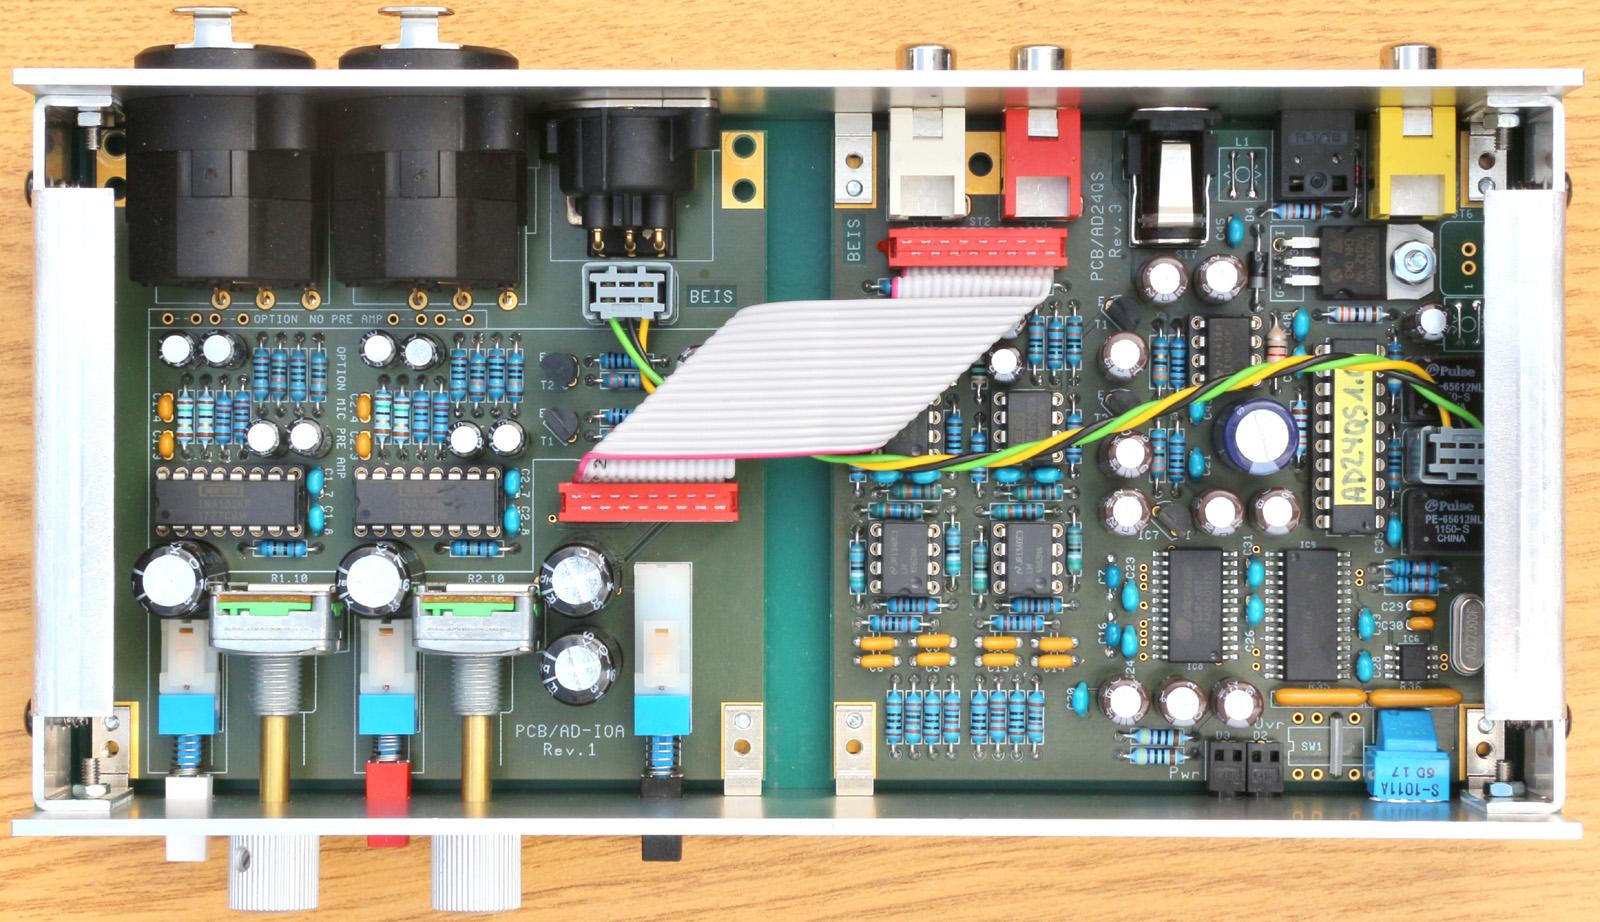 AD24QS-IOA_Top_1600 Xlr Wiring Diagram on g6 wiring diagram, xts wiring diagram, flagstaff wiring diagram, model wiring diagram, raptor wiring diagram, power wiring diagram, work and play wiring diagram, 3-pin mic wiring diagram, ml wiring diagram, dmx led controller wiring diagram, wildcat wiring diagram, trs cable wiring diagram, regal wiring diagram, vibe wiring diagram, cyclone wiring diagram, yukon wiring diagram, challenger wiring diagram, cts v wiring diagram, lucerne wiring diagram, speaker wiring diagram,